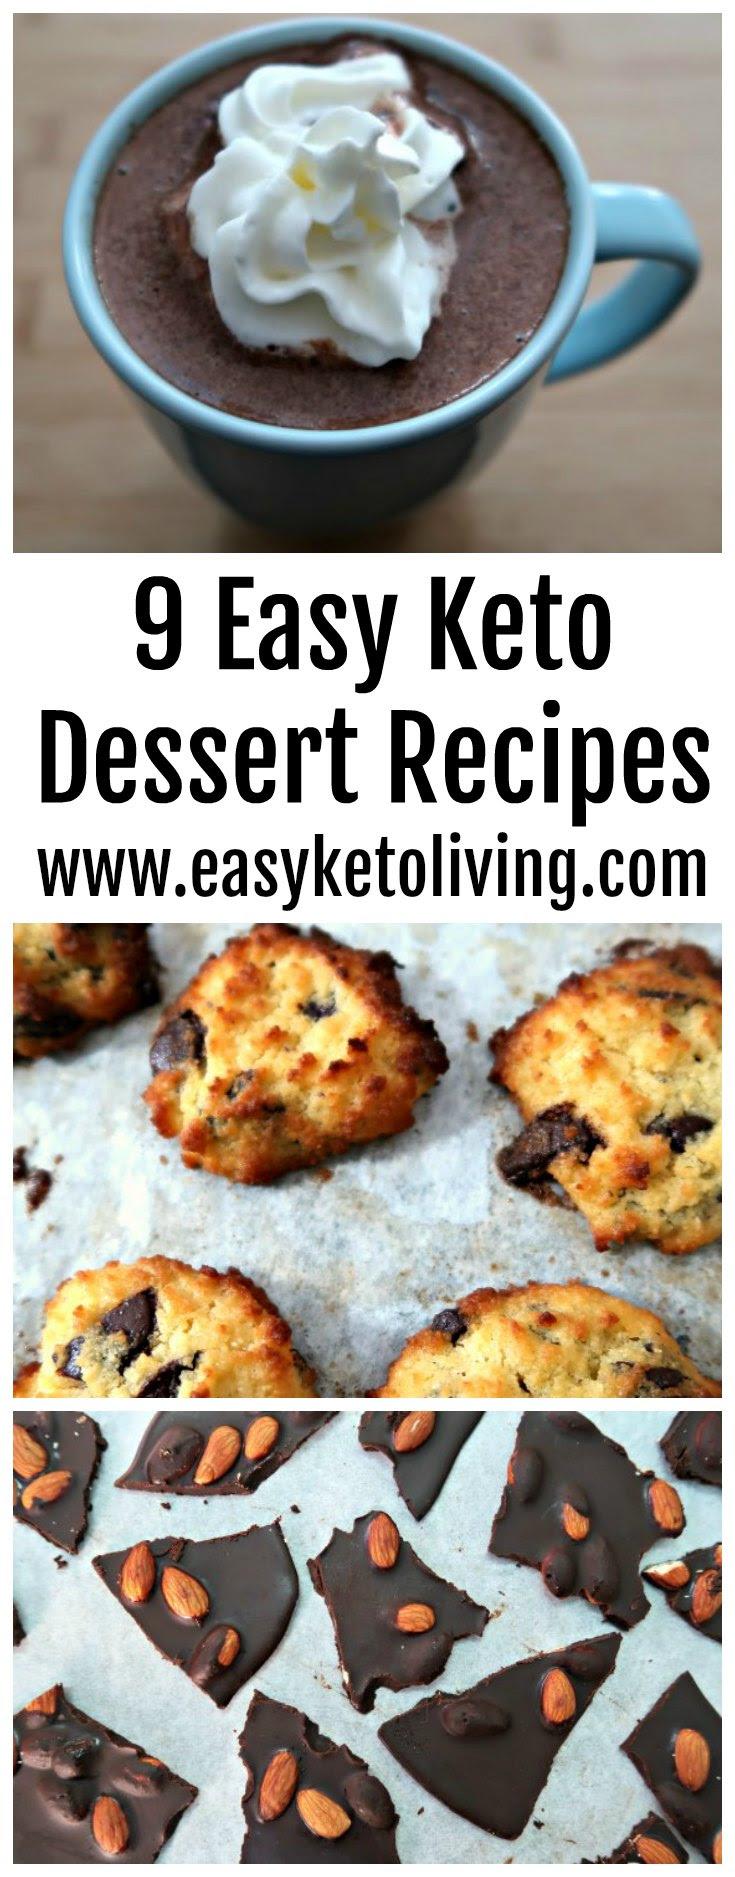 9 Easy Keto Dessert Recipes - Quick Low Carb Ketogenic ...